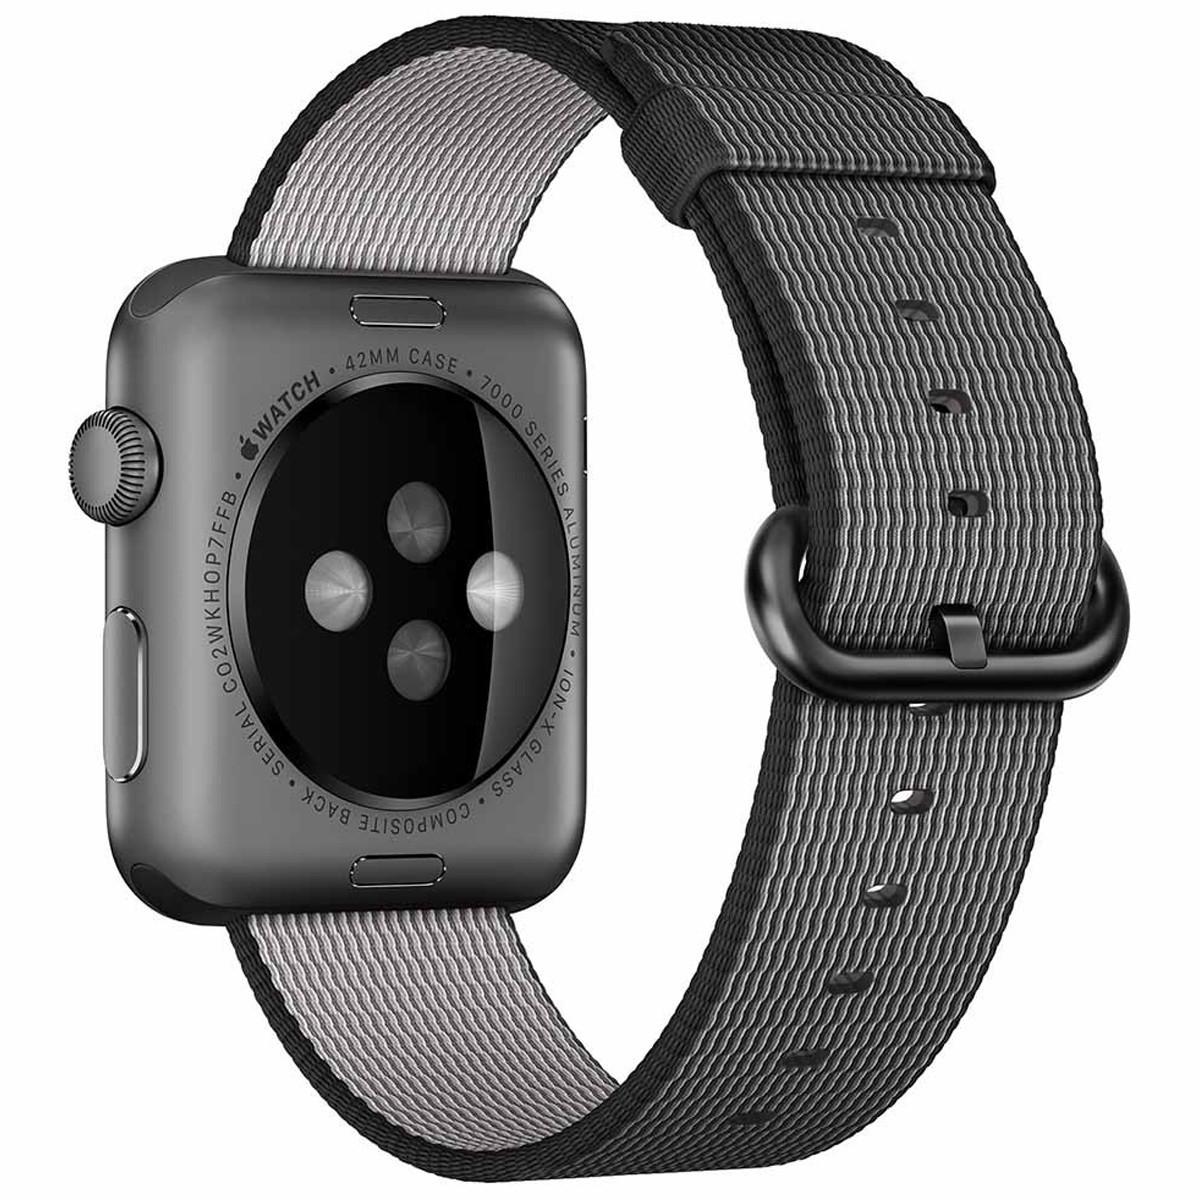 Curea pentru Apple Watch 38 mm iUni Woven Strap, Nylon, Electric Gray